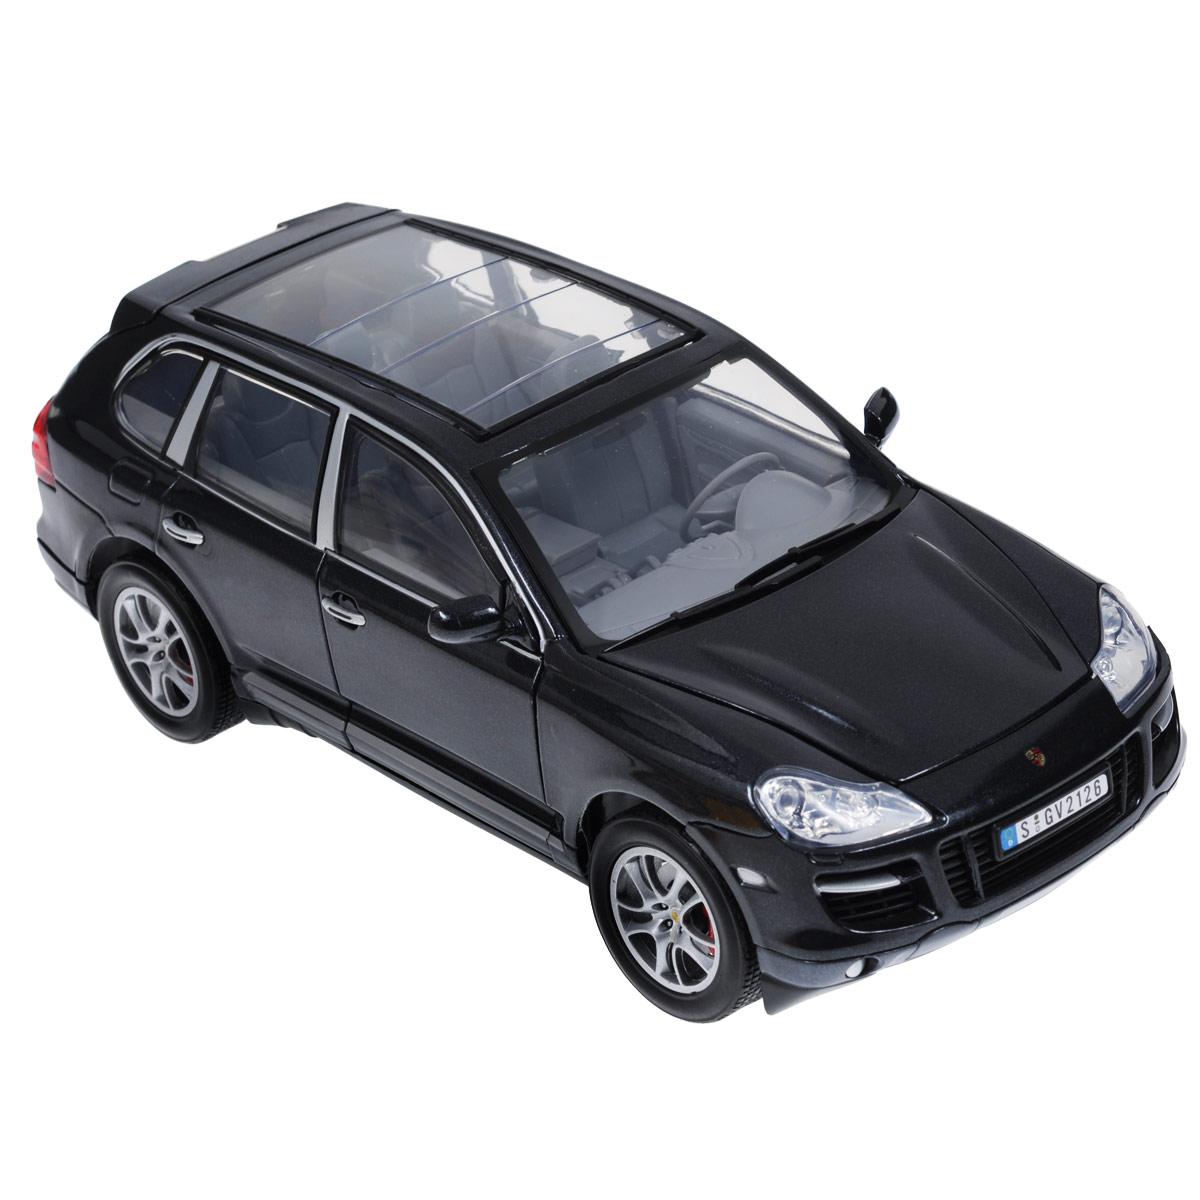 Autotime Модель автомобиля Porsche Cayenne Turbo autotime модель автомобиля maz 5335 техпомощь